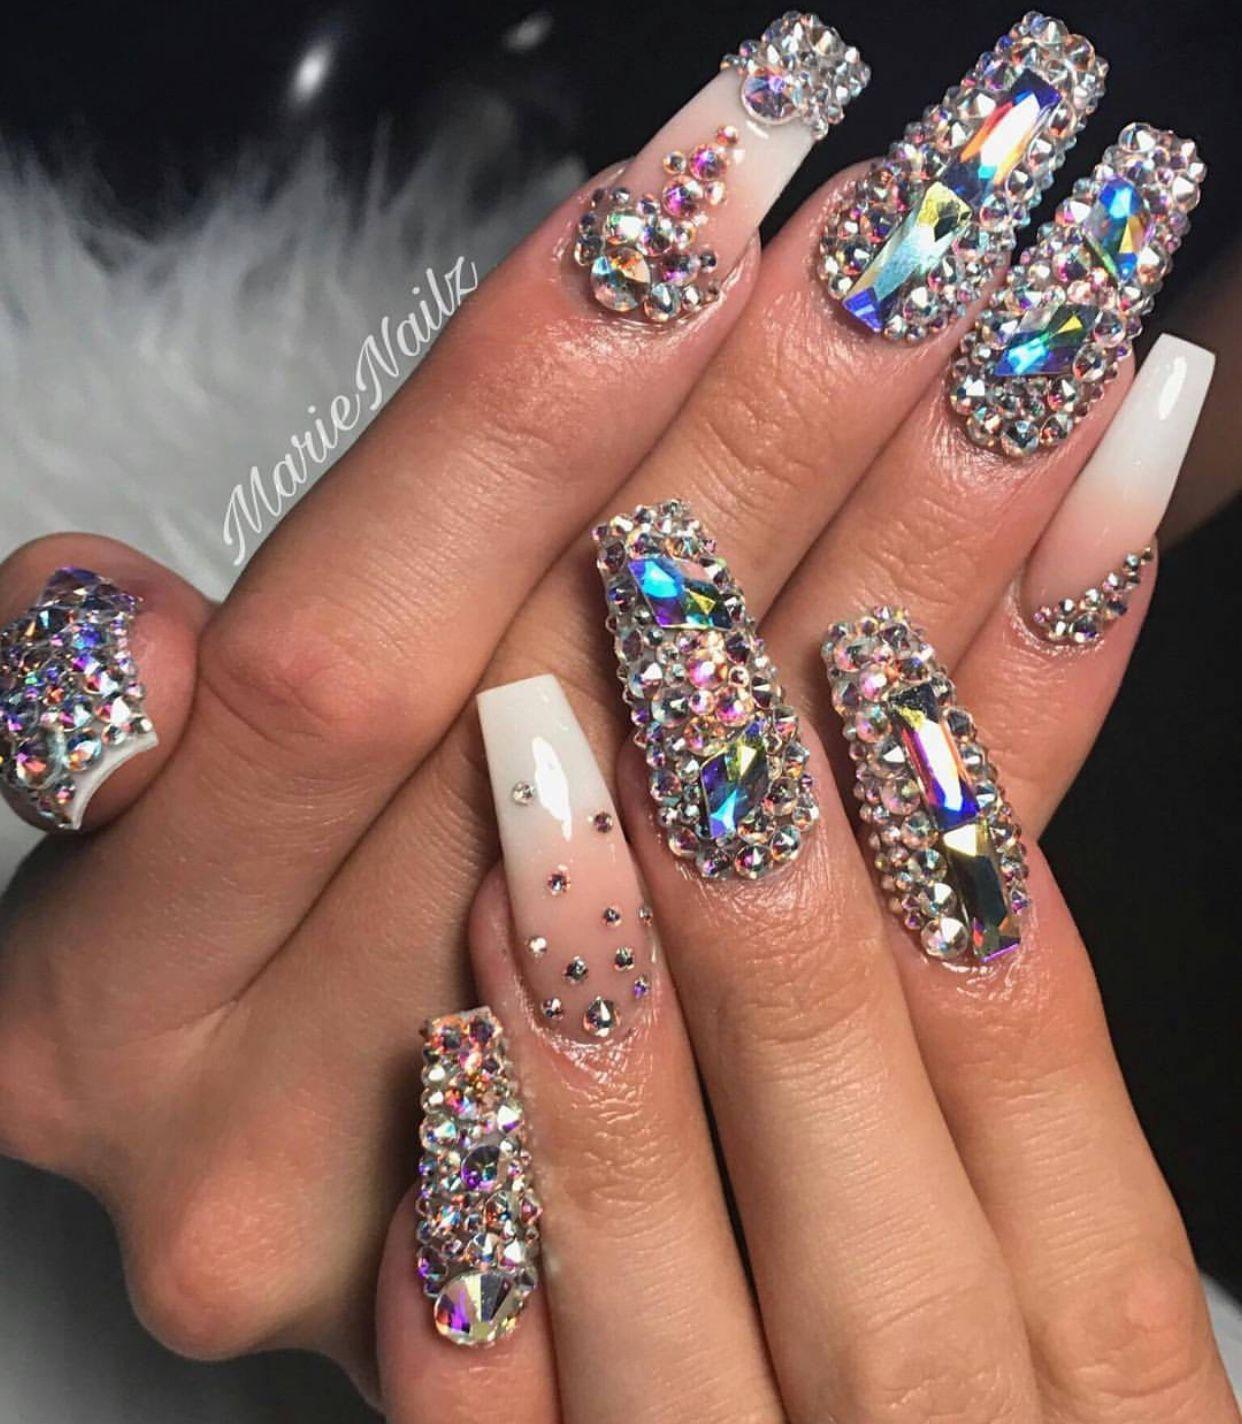 Diamond Nail Design White And Pink Nails Coffin Acrylic Nails Pin Amerishabeauty Diamond Nail Designs Diamond Nails Bling Nails